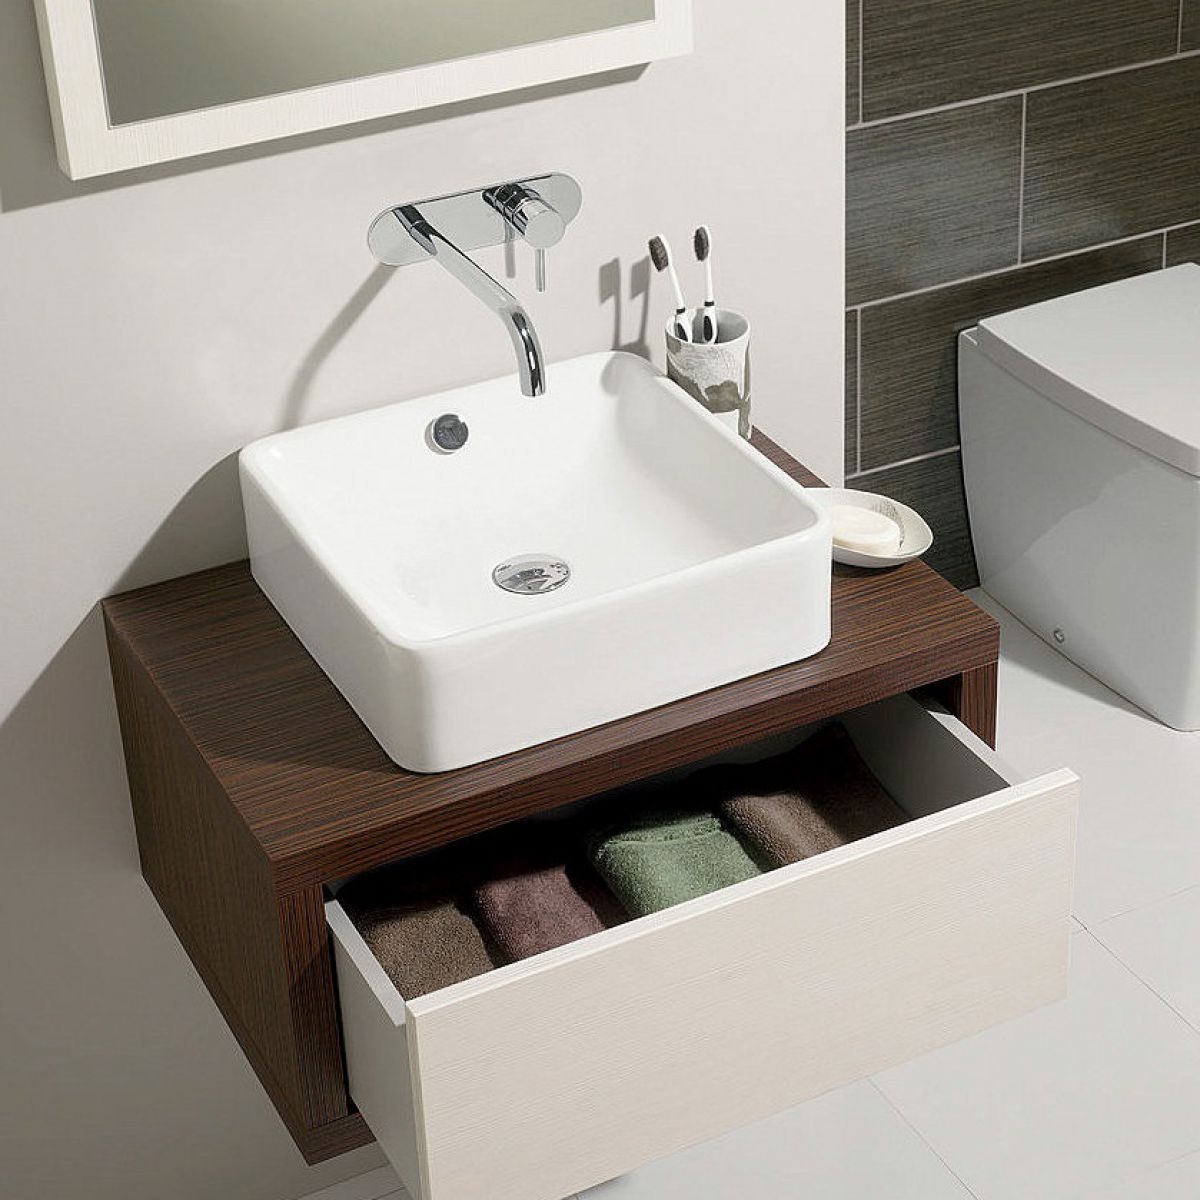 bathroom square special model sinks